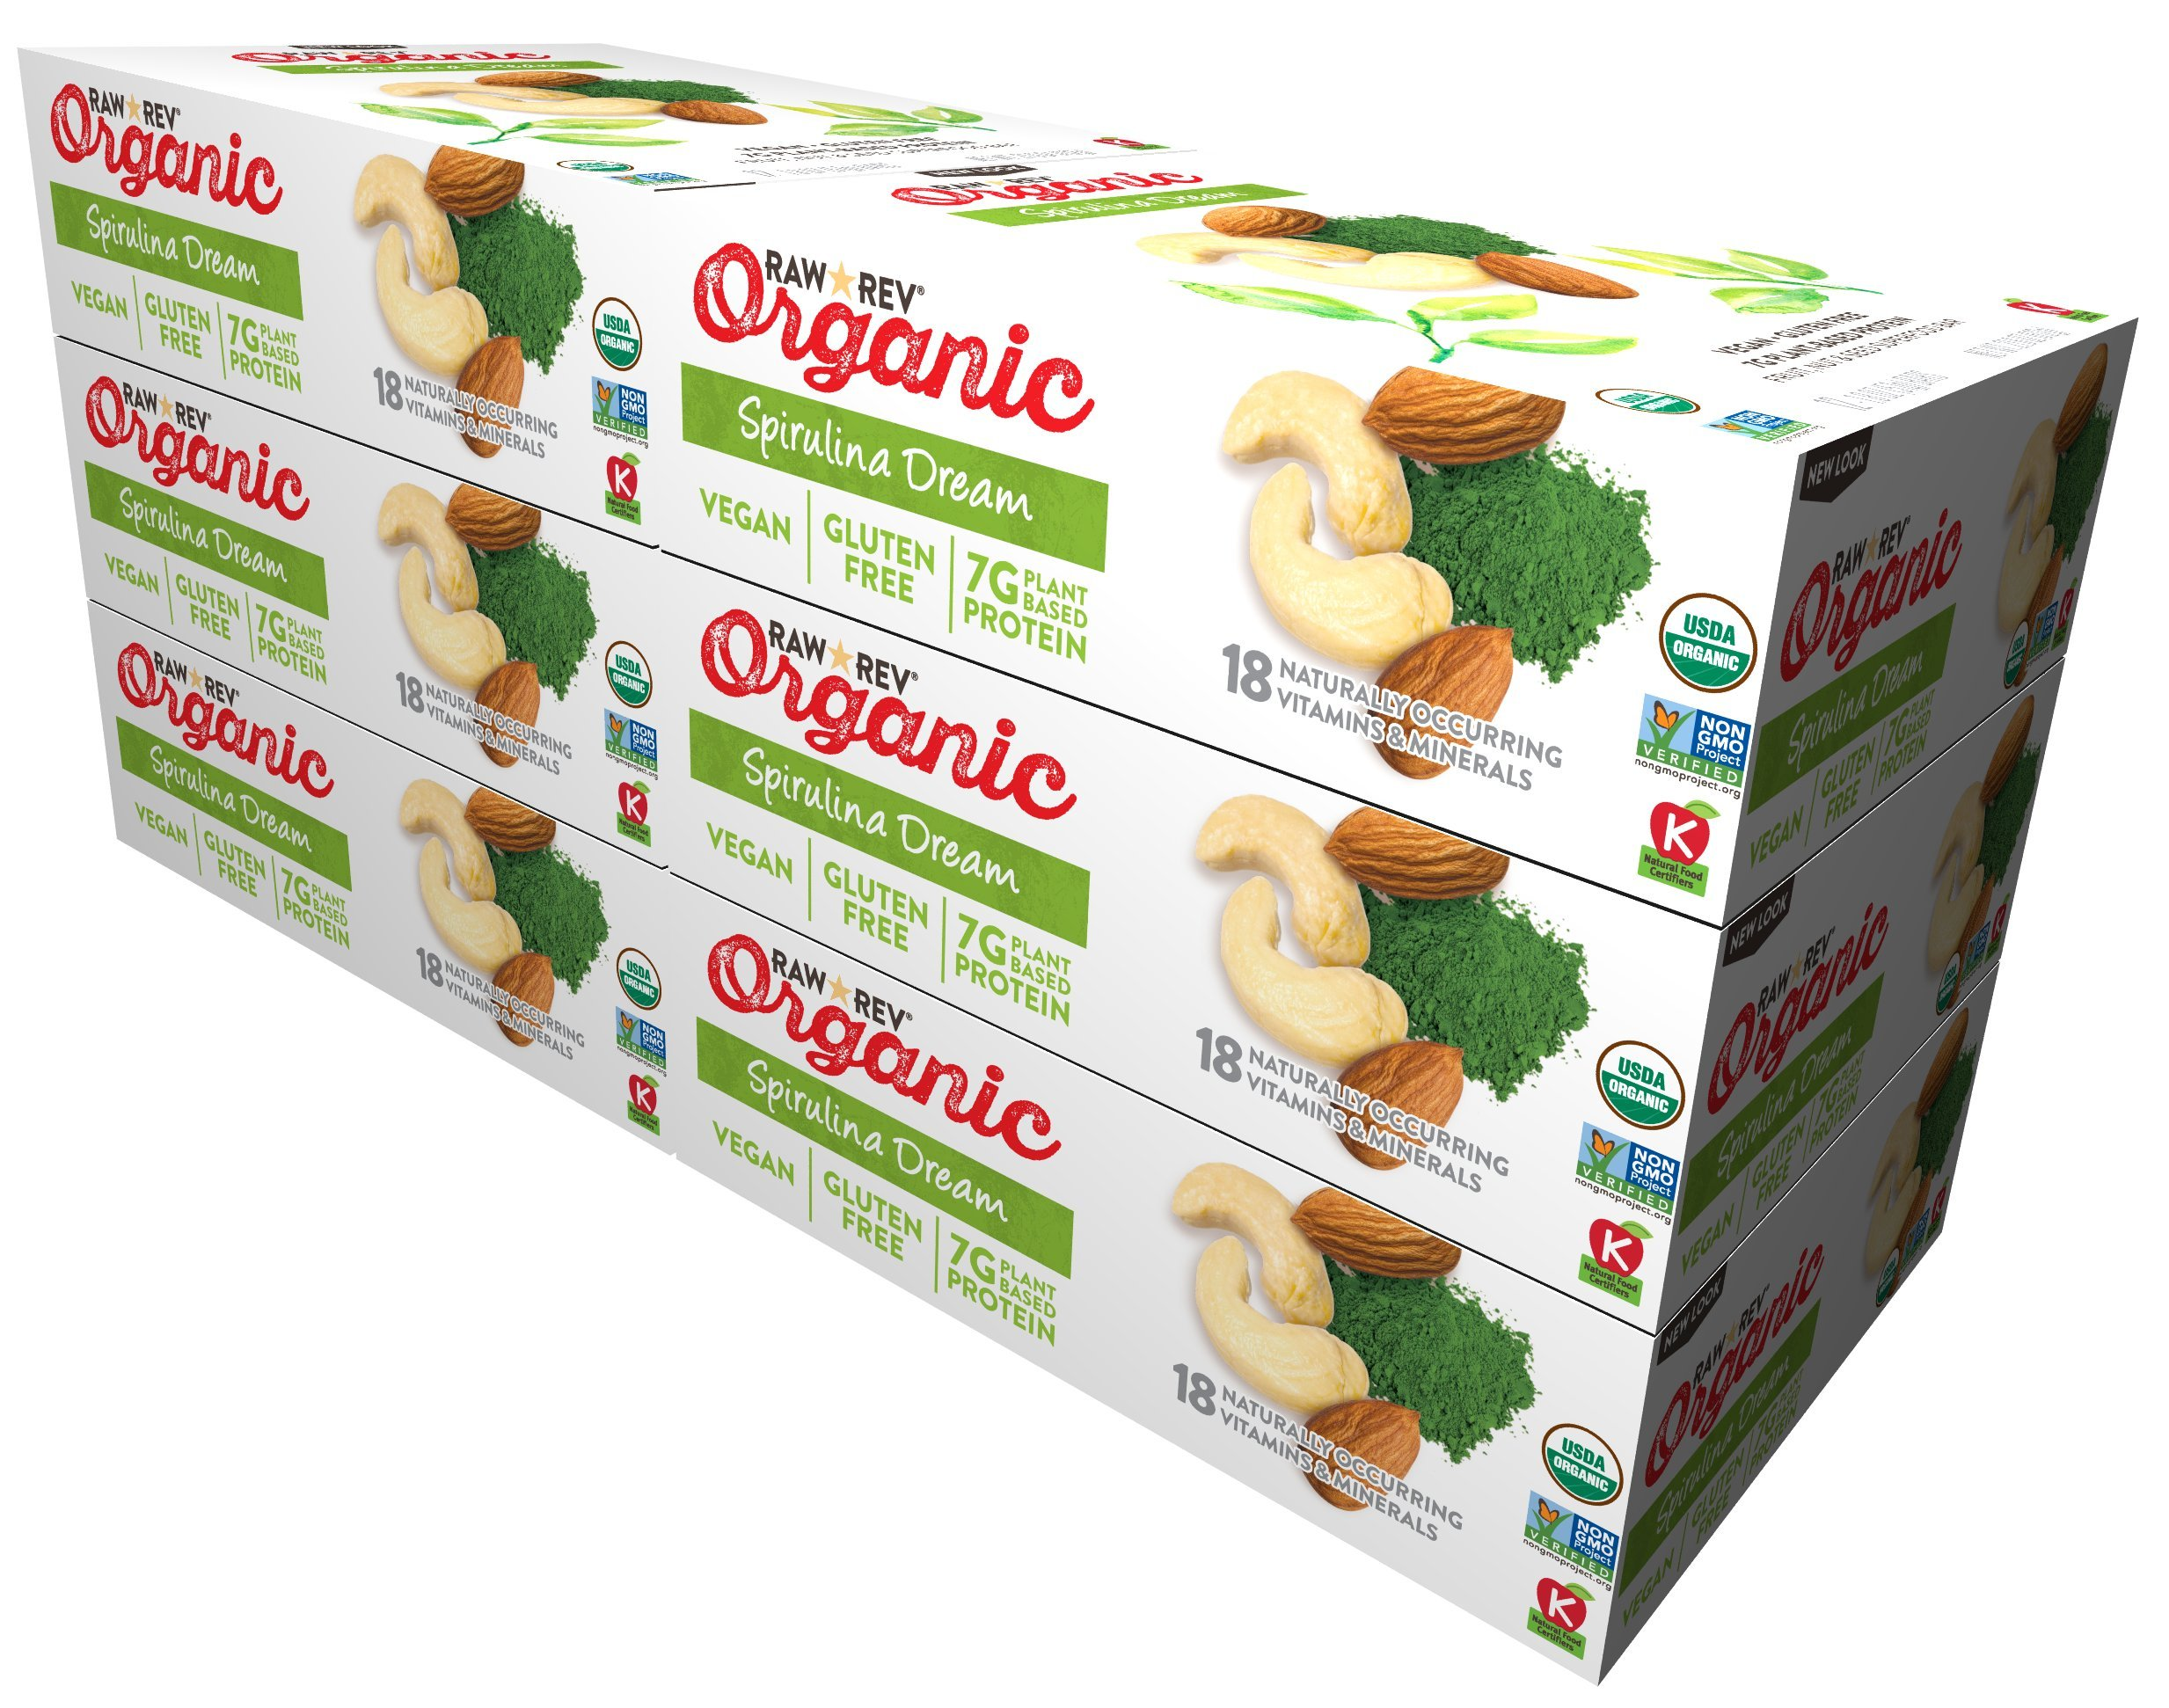 Raw Rev Organic Vegan, Gluten-Free Fruit, Nut, Seed Bars – Spirulina Dream 1.8 ounce (Pack of 72)